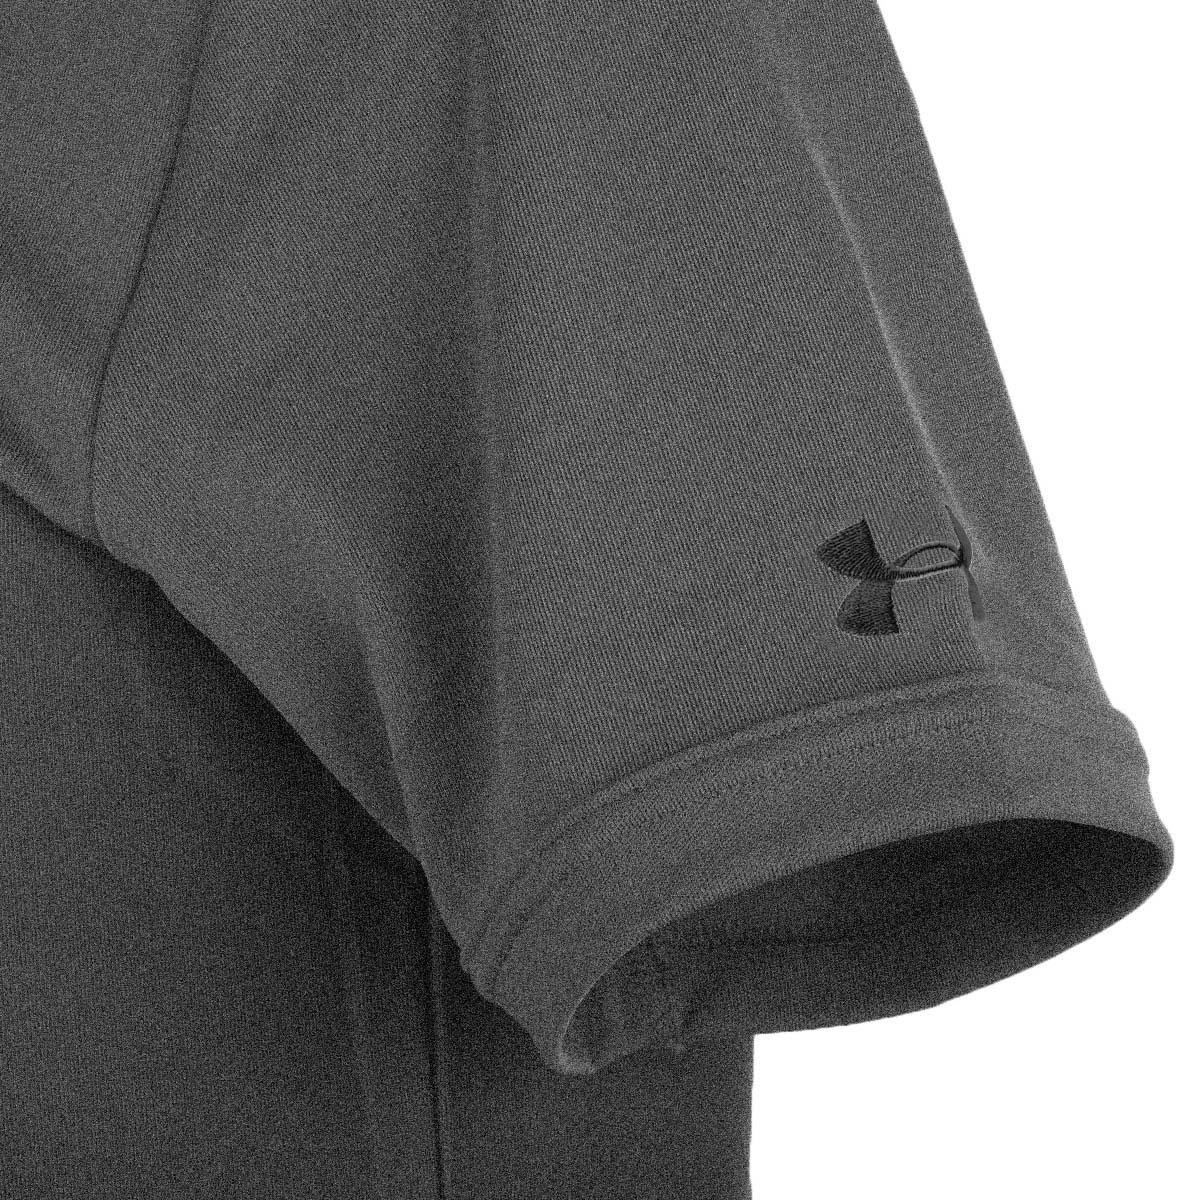 Under-Armour-Mens-Medal-Play-Performance-Polo-Shirt-UA-Golf-Short-Sleeve thumbnail 18